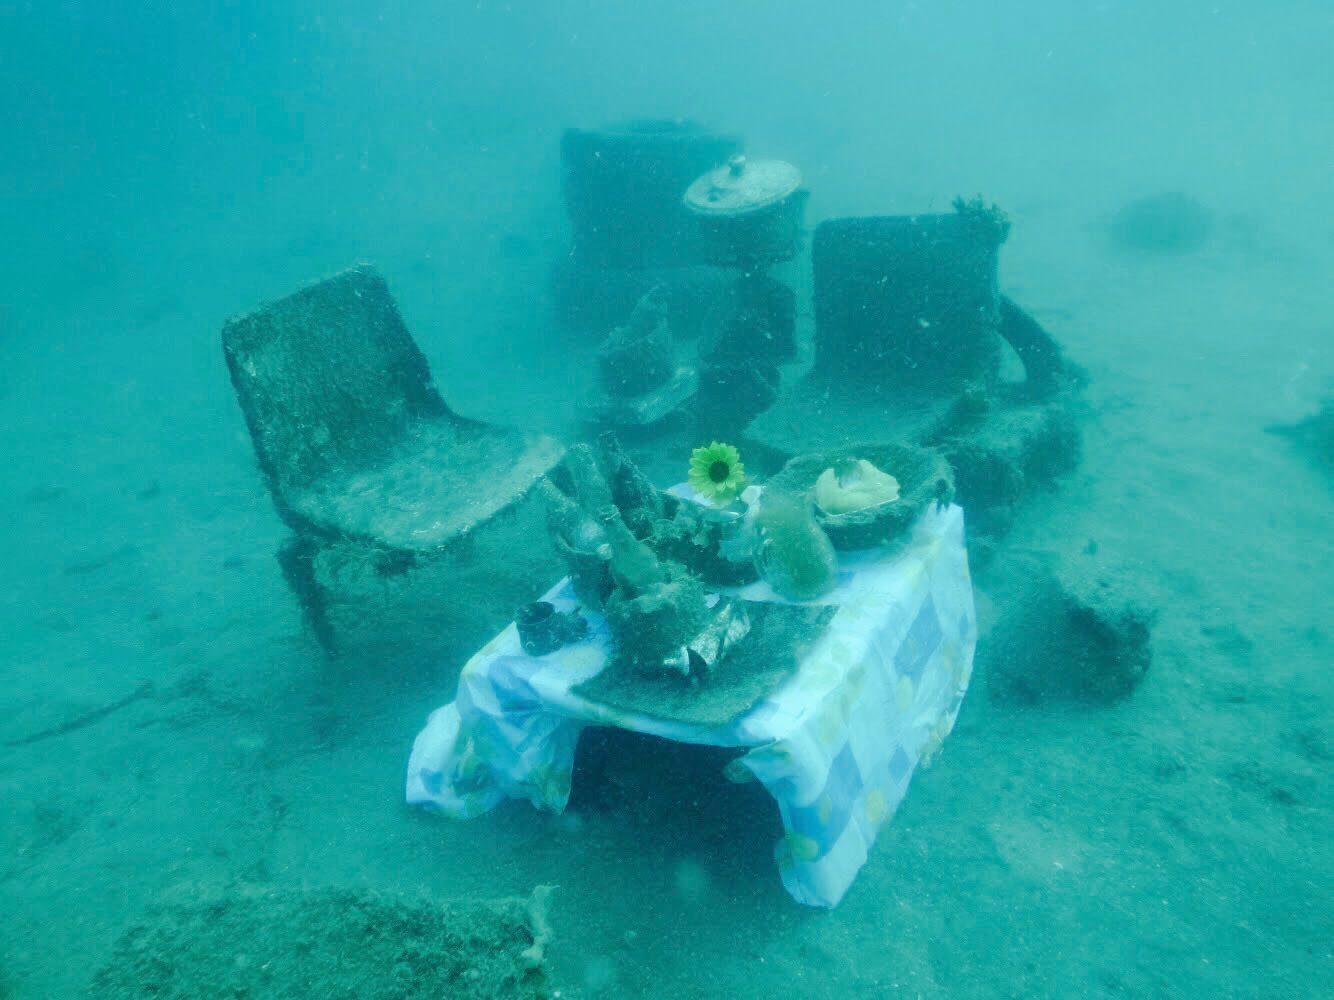 Underwater Bar: Ocean Plastic Waste as Art Material - Julia